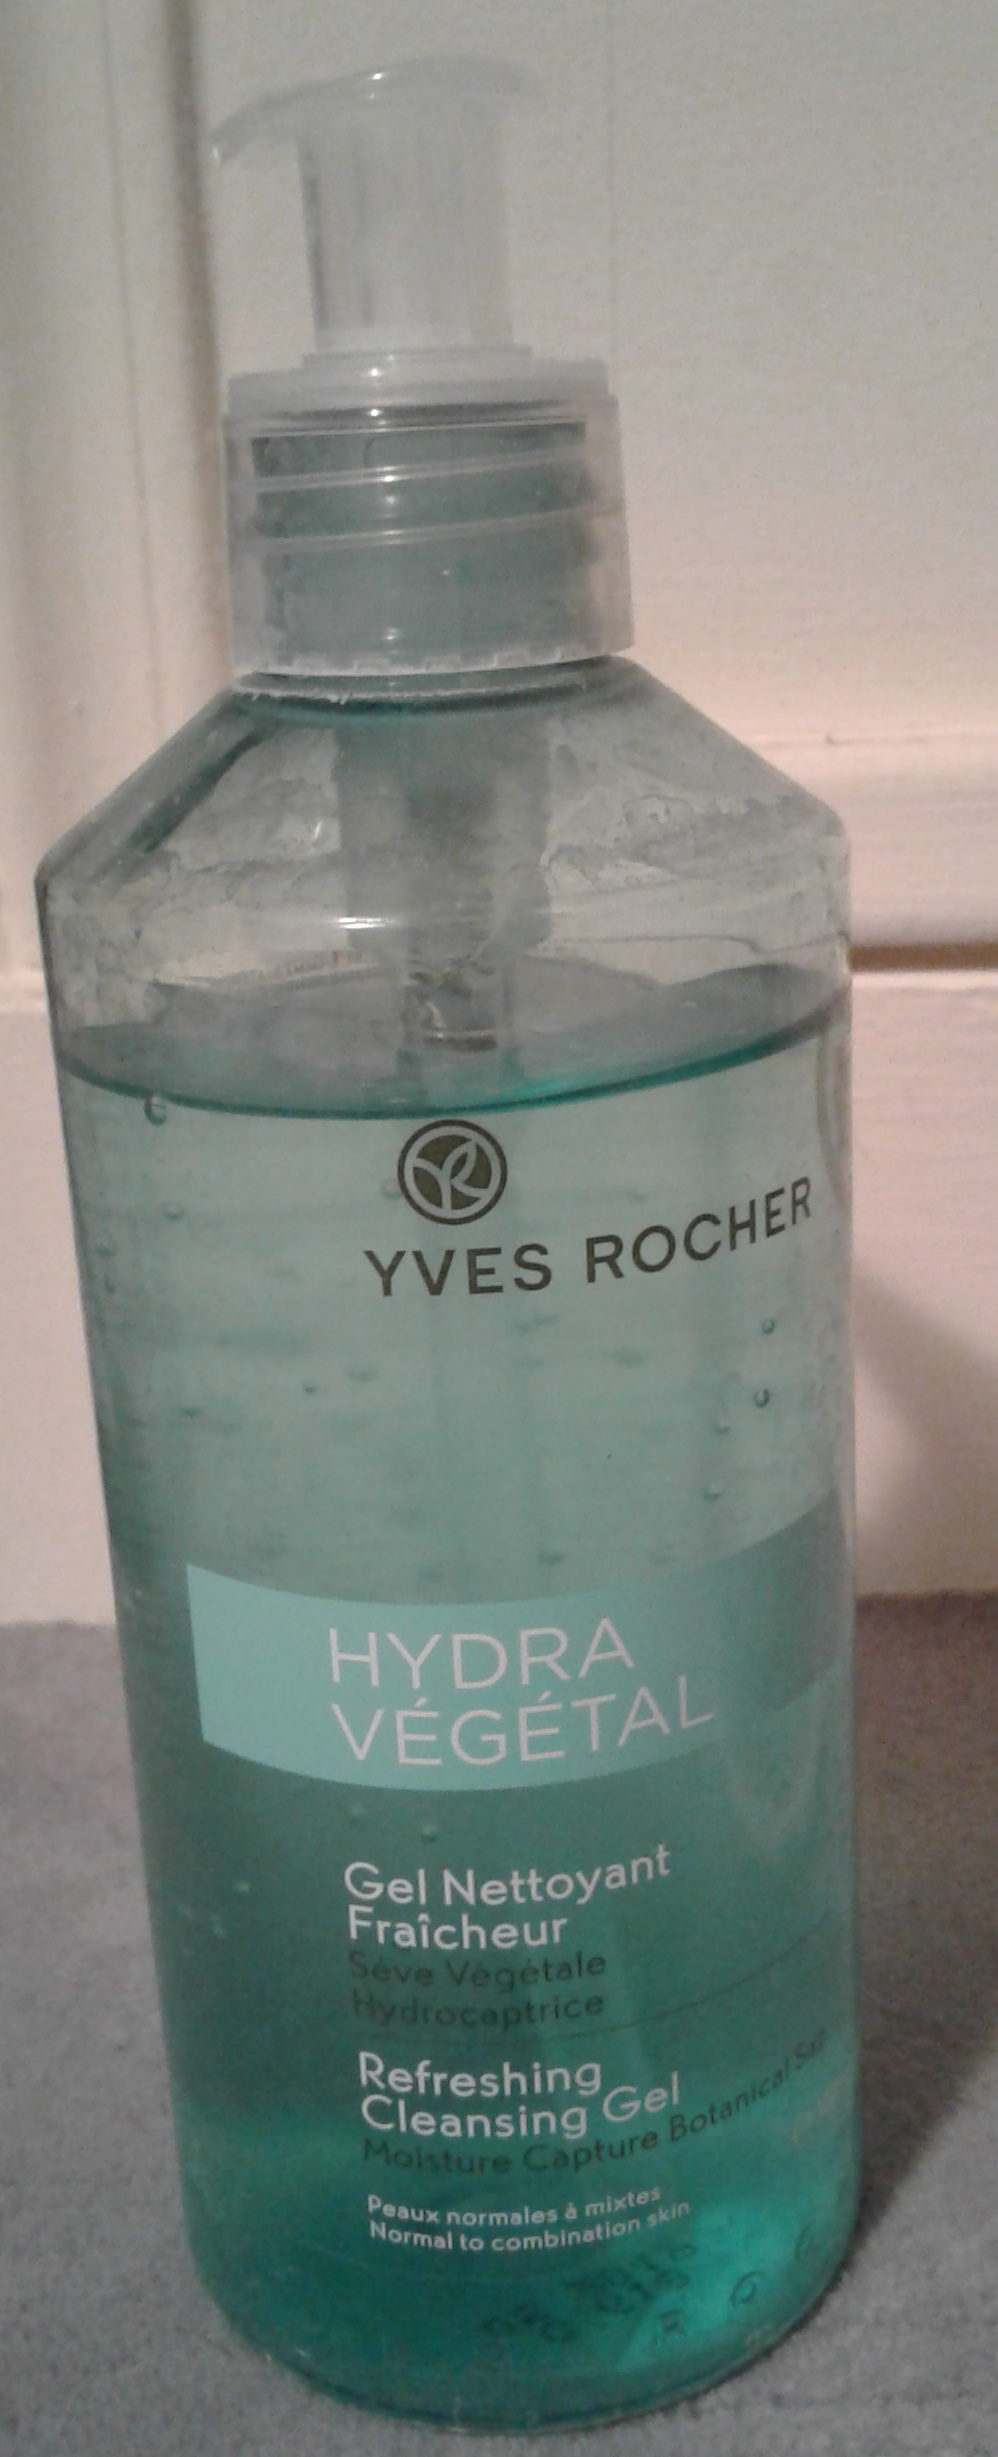 Hydra végétal - Product - fr